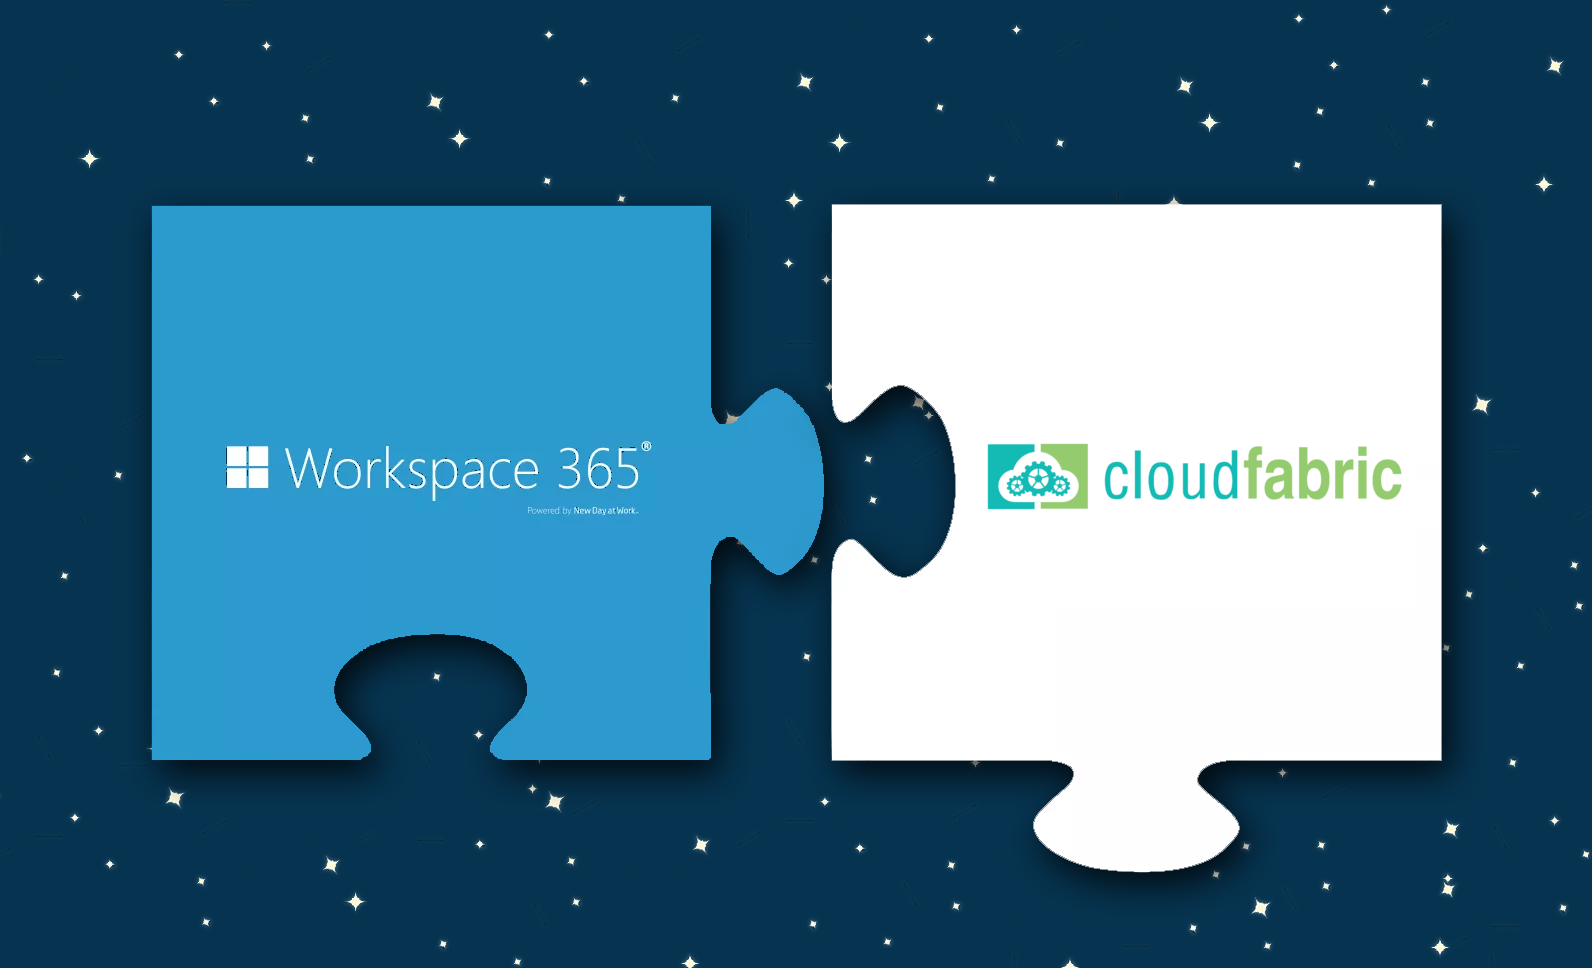 Cloudfabric Workspace 365